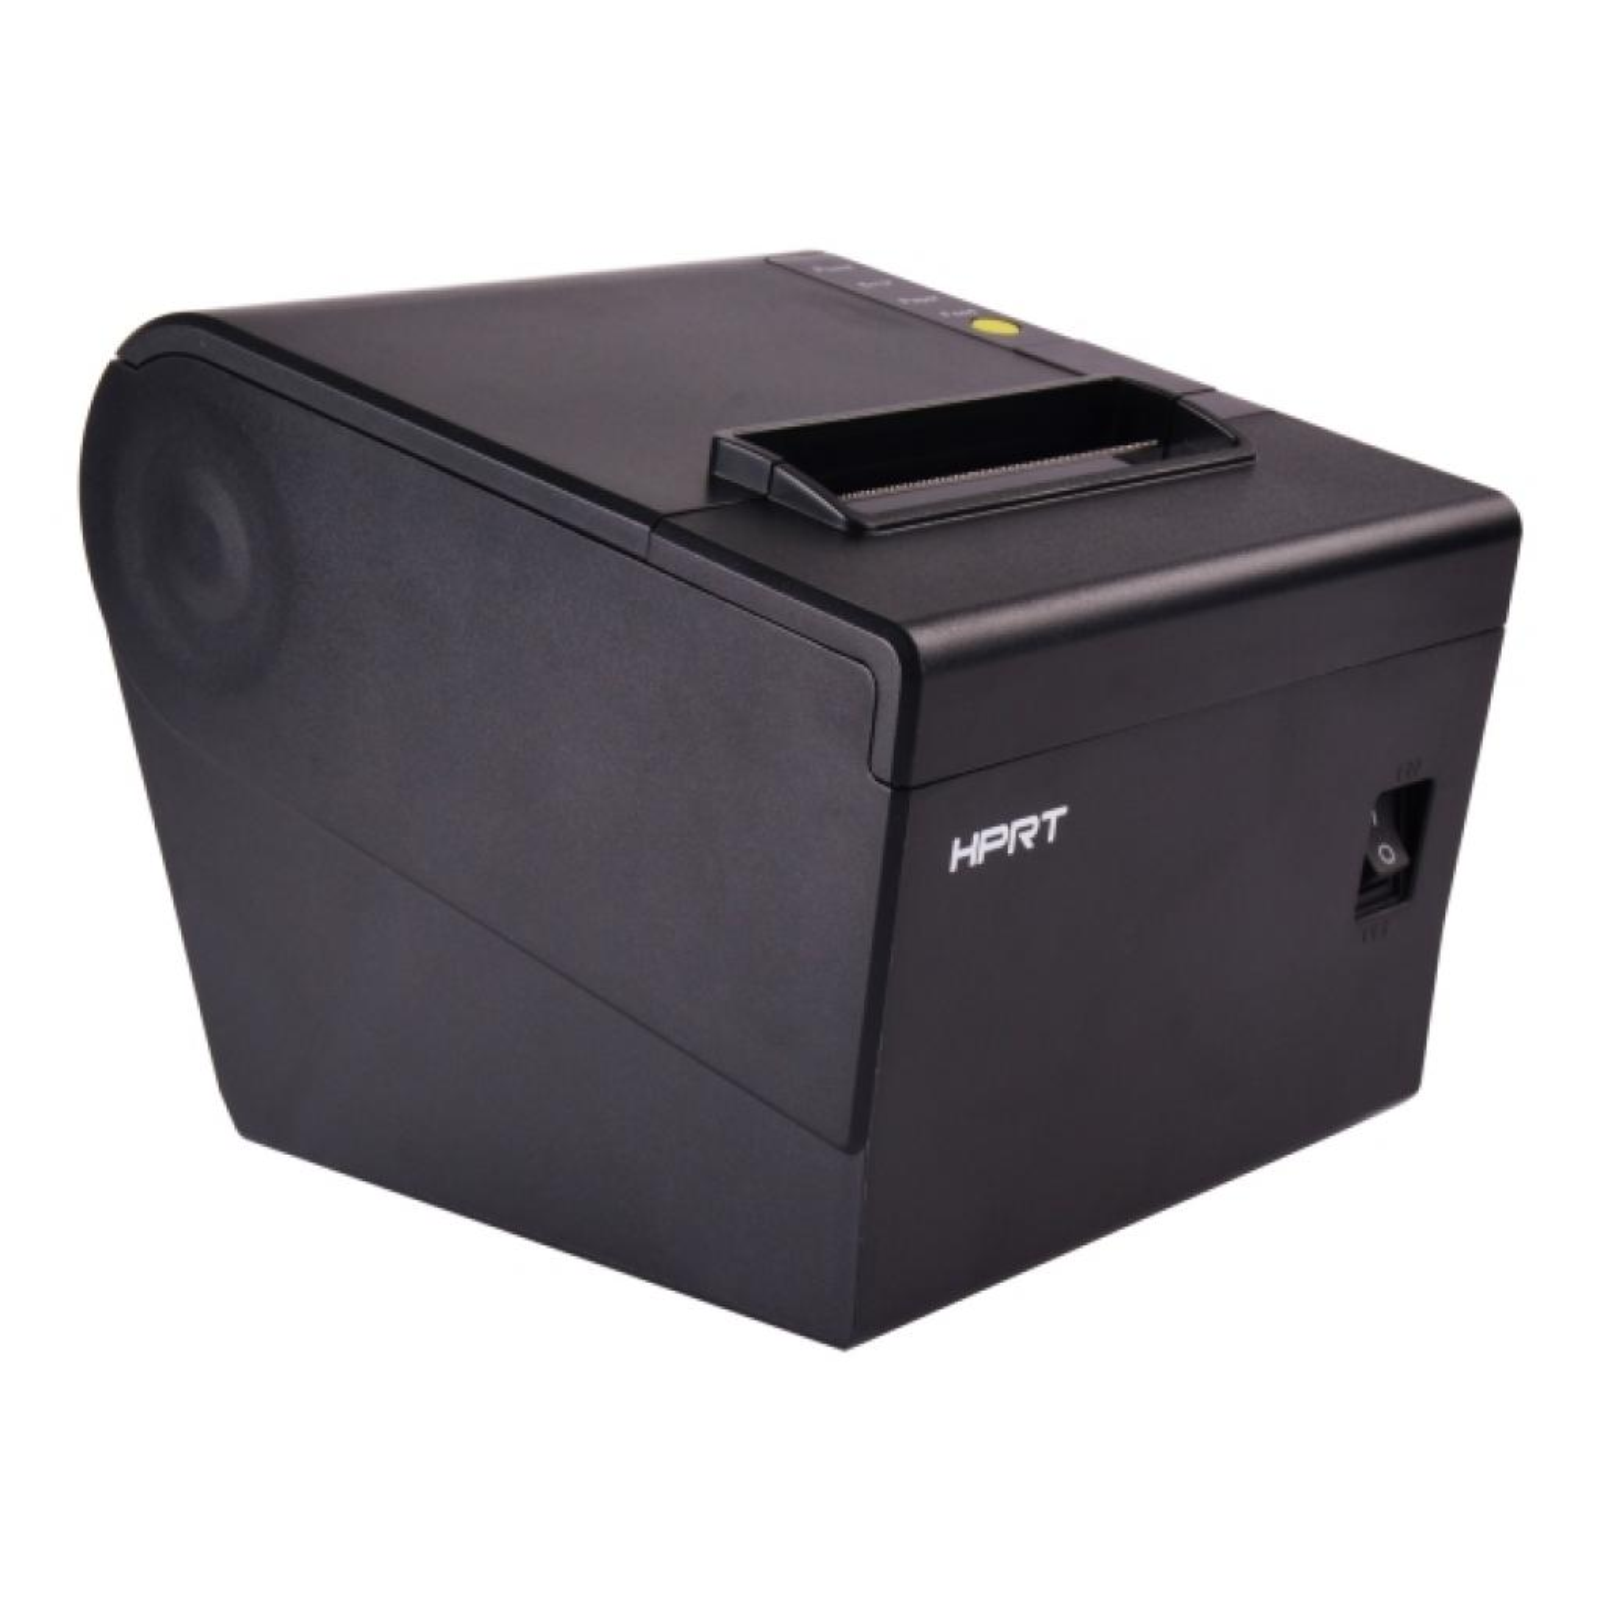 Принтер чеков HPRT TP806 Serial+USB (8931)